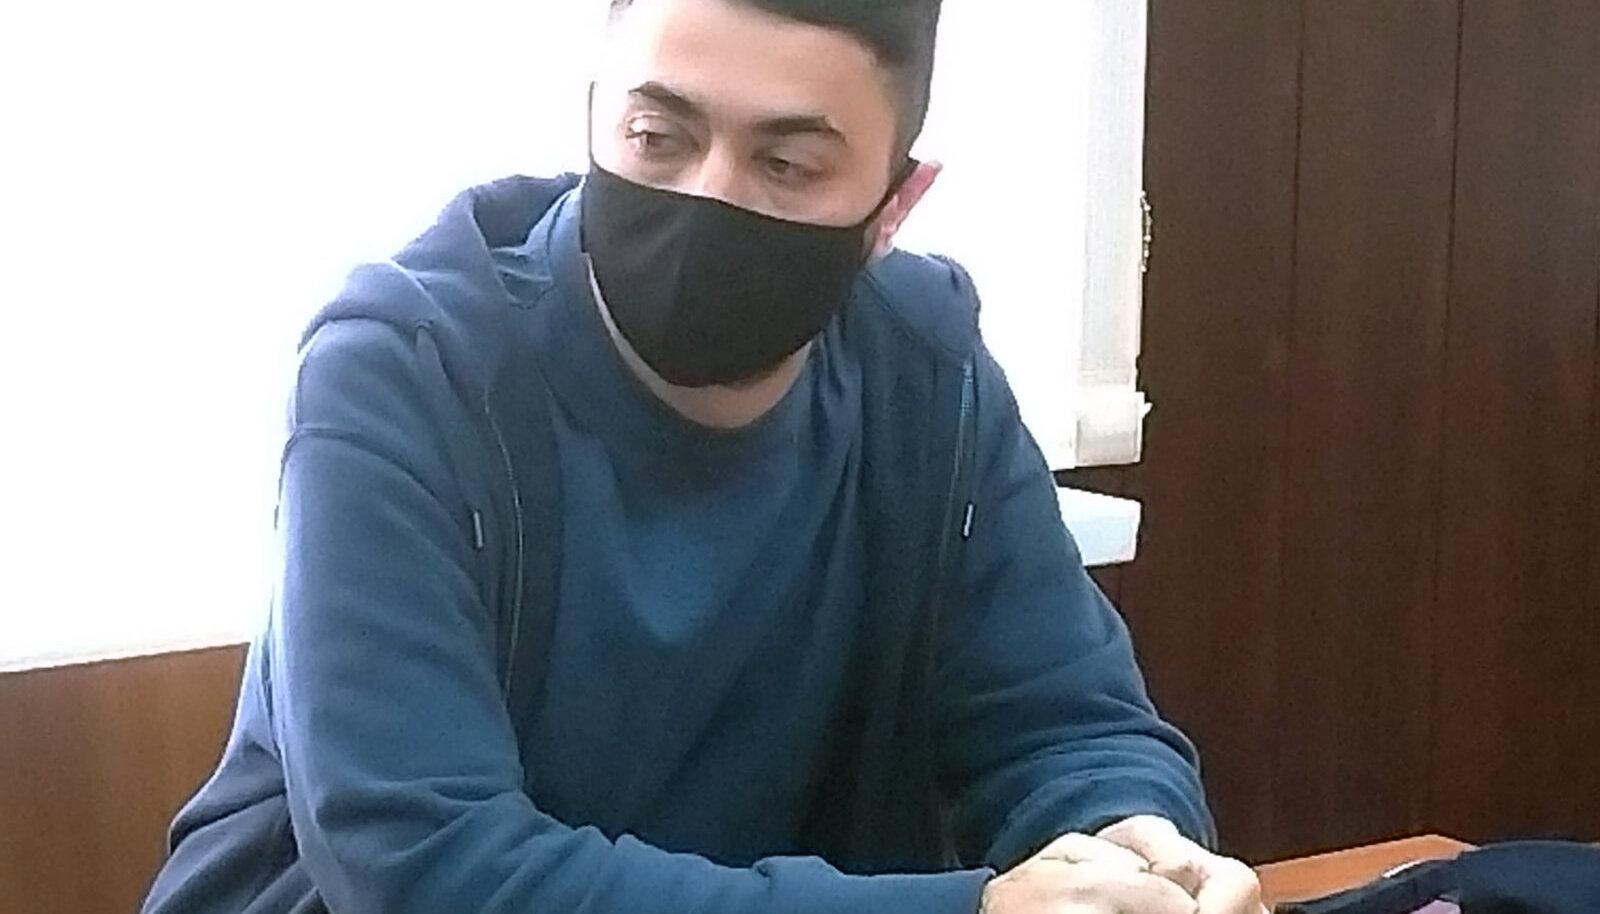 Idrak Mirzalizade sel kuul Moskva kohtus.